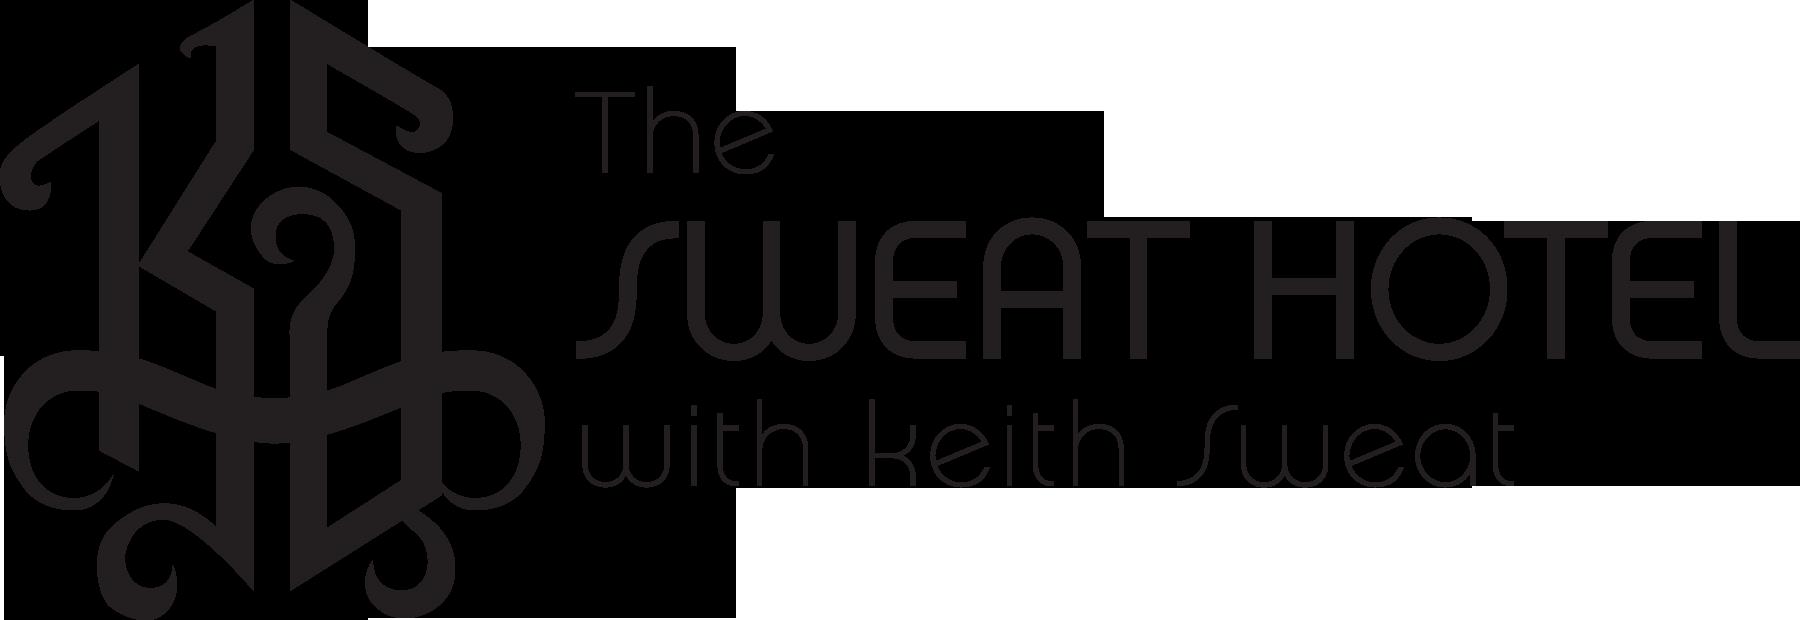 SweatHotel-bw-hi-res